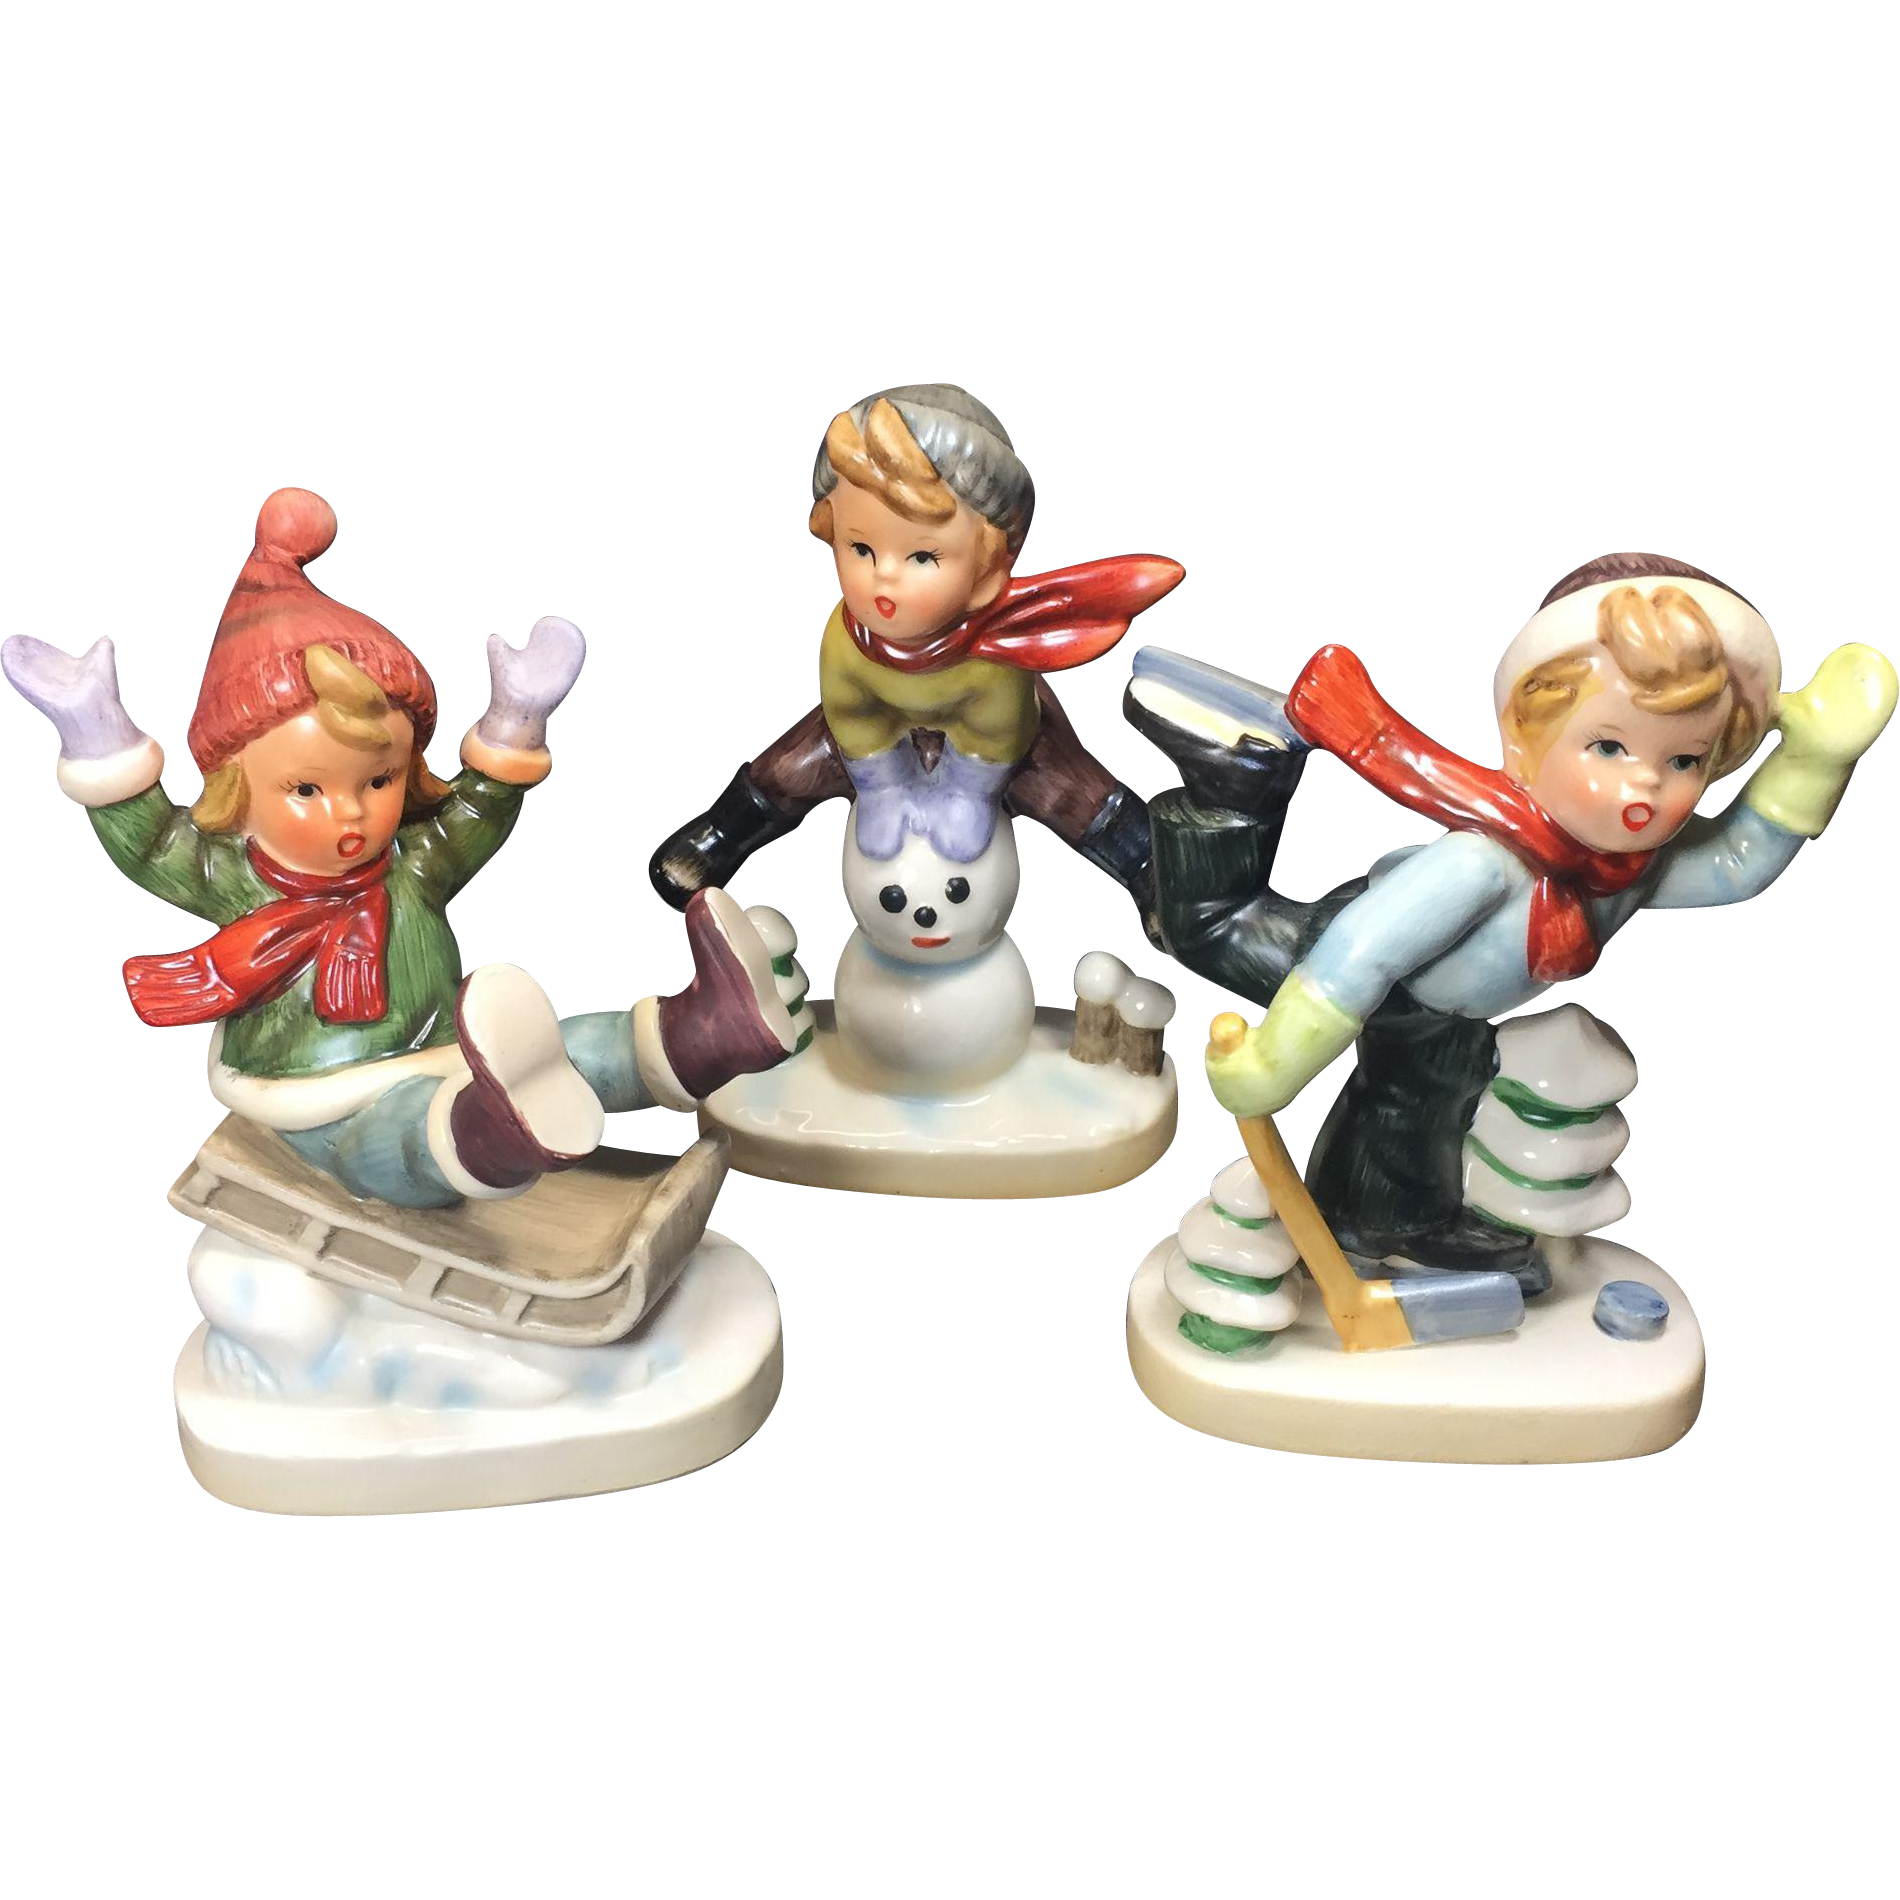 Vintage Winter Fun Boy Figurines Napco Ceramic Japan